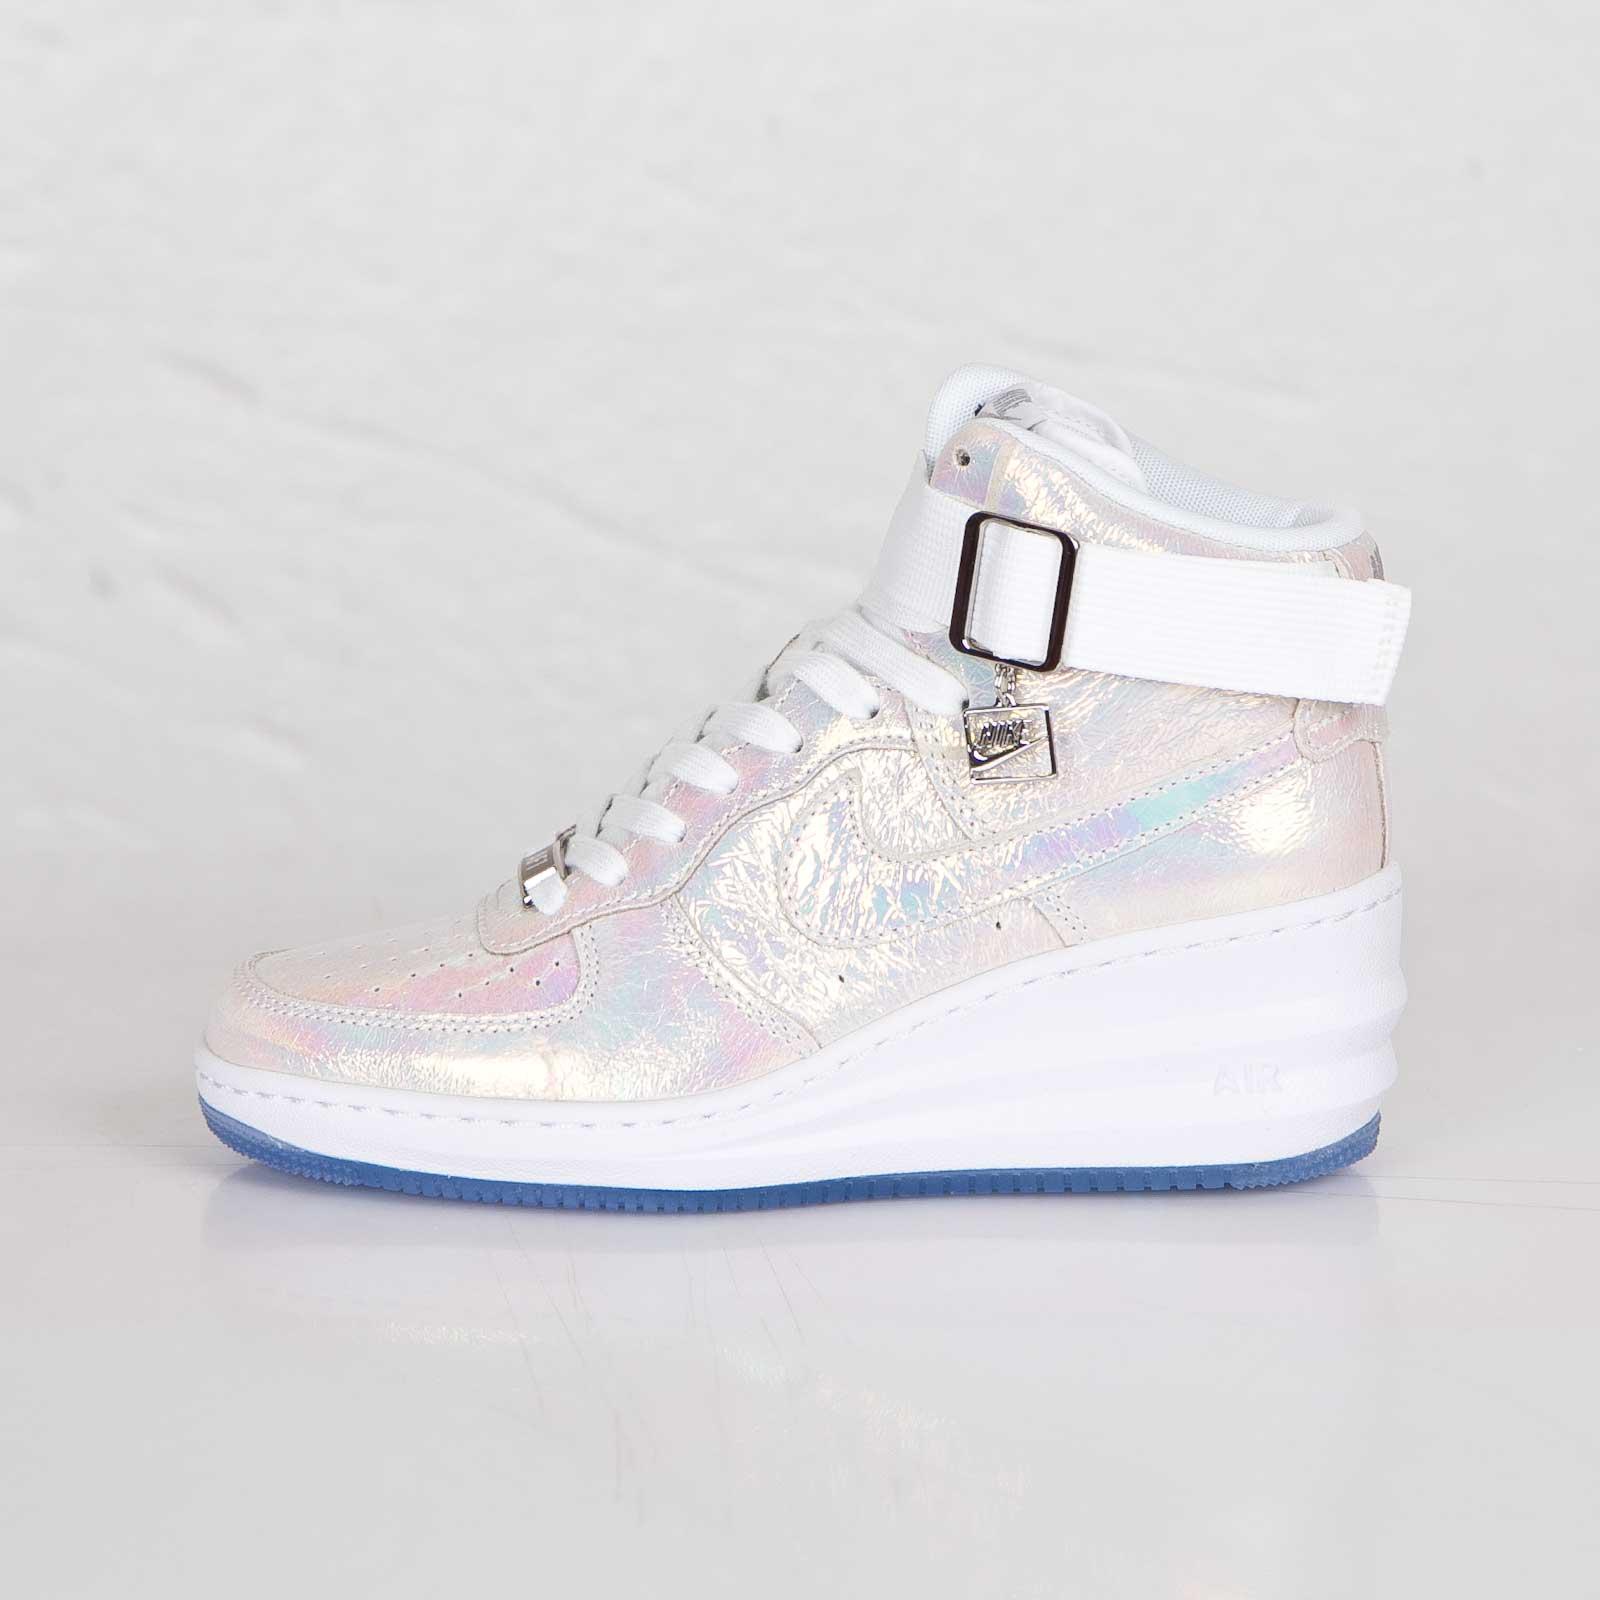 best authentic 8da79 2de0e Nike Wmns Lunar Force 1 Sky Hi Premium QS - 704518-100 - Sneakersnstuff    sneakers   streetwear online since 1999